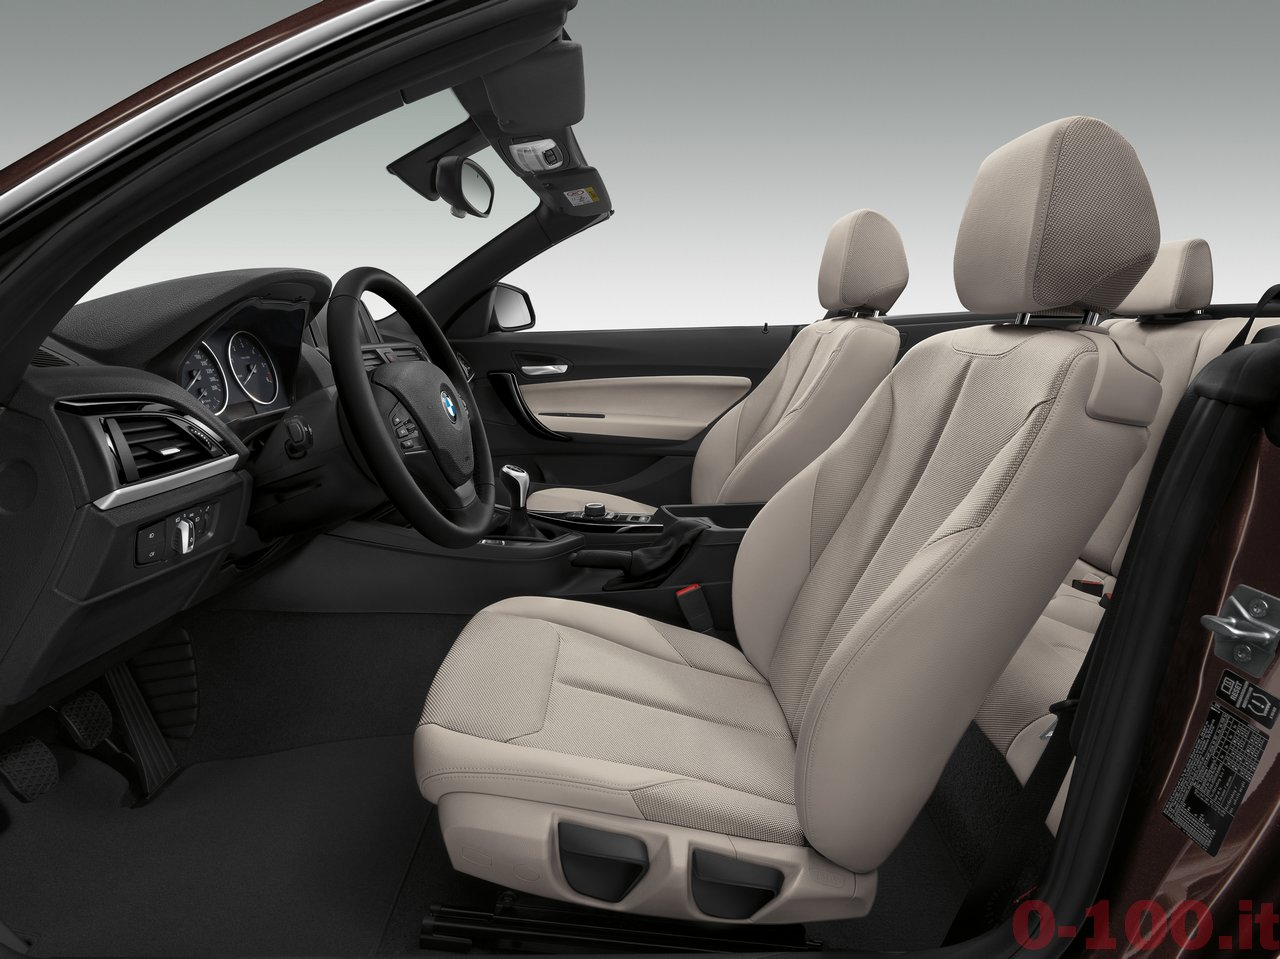 bmw-serie-2-235i-220i-220d-cabriolet_0-100_7